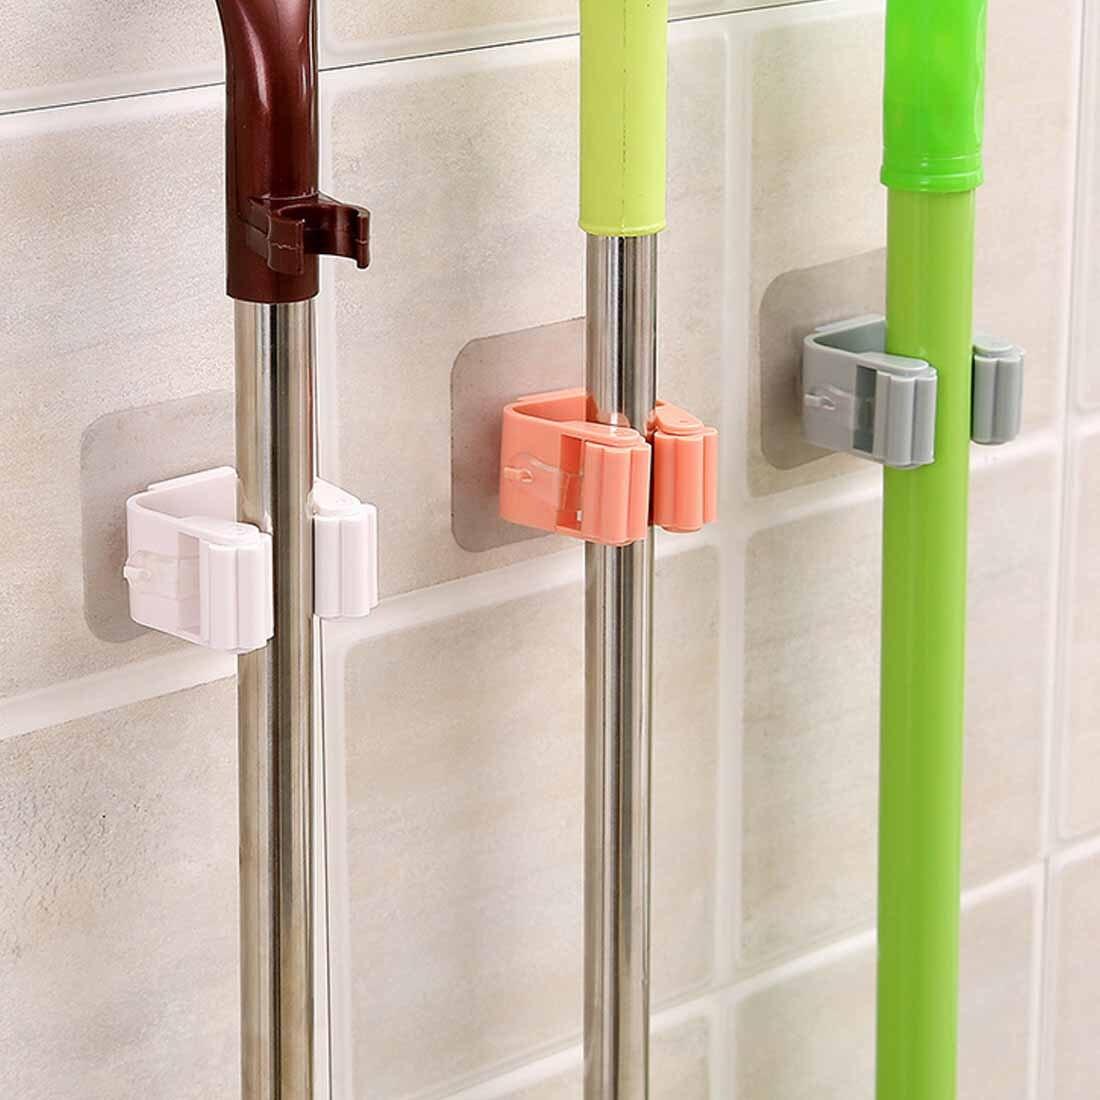 1pcs Mop Holder Kitchen Organizer Garden Storage Wall Mounted  Brush Broom Hanger Storage Rack Cleaning Tools On Walls